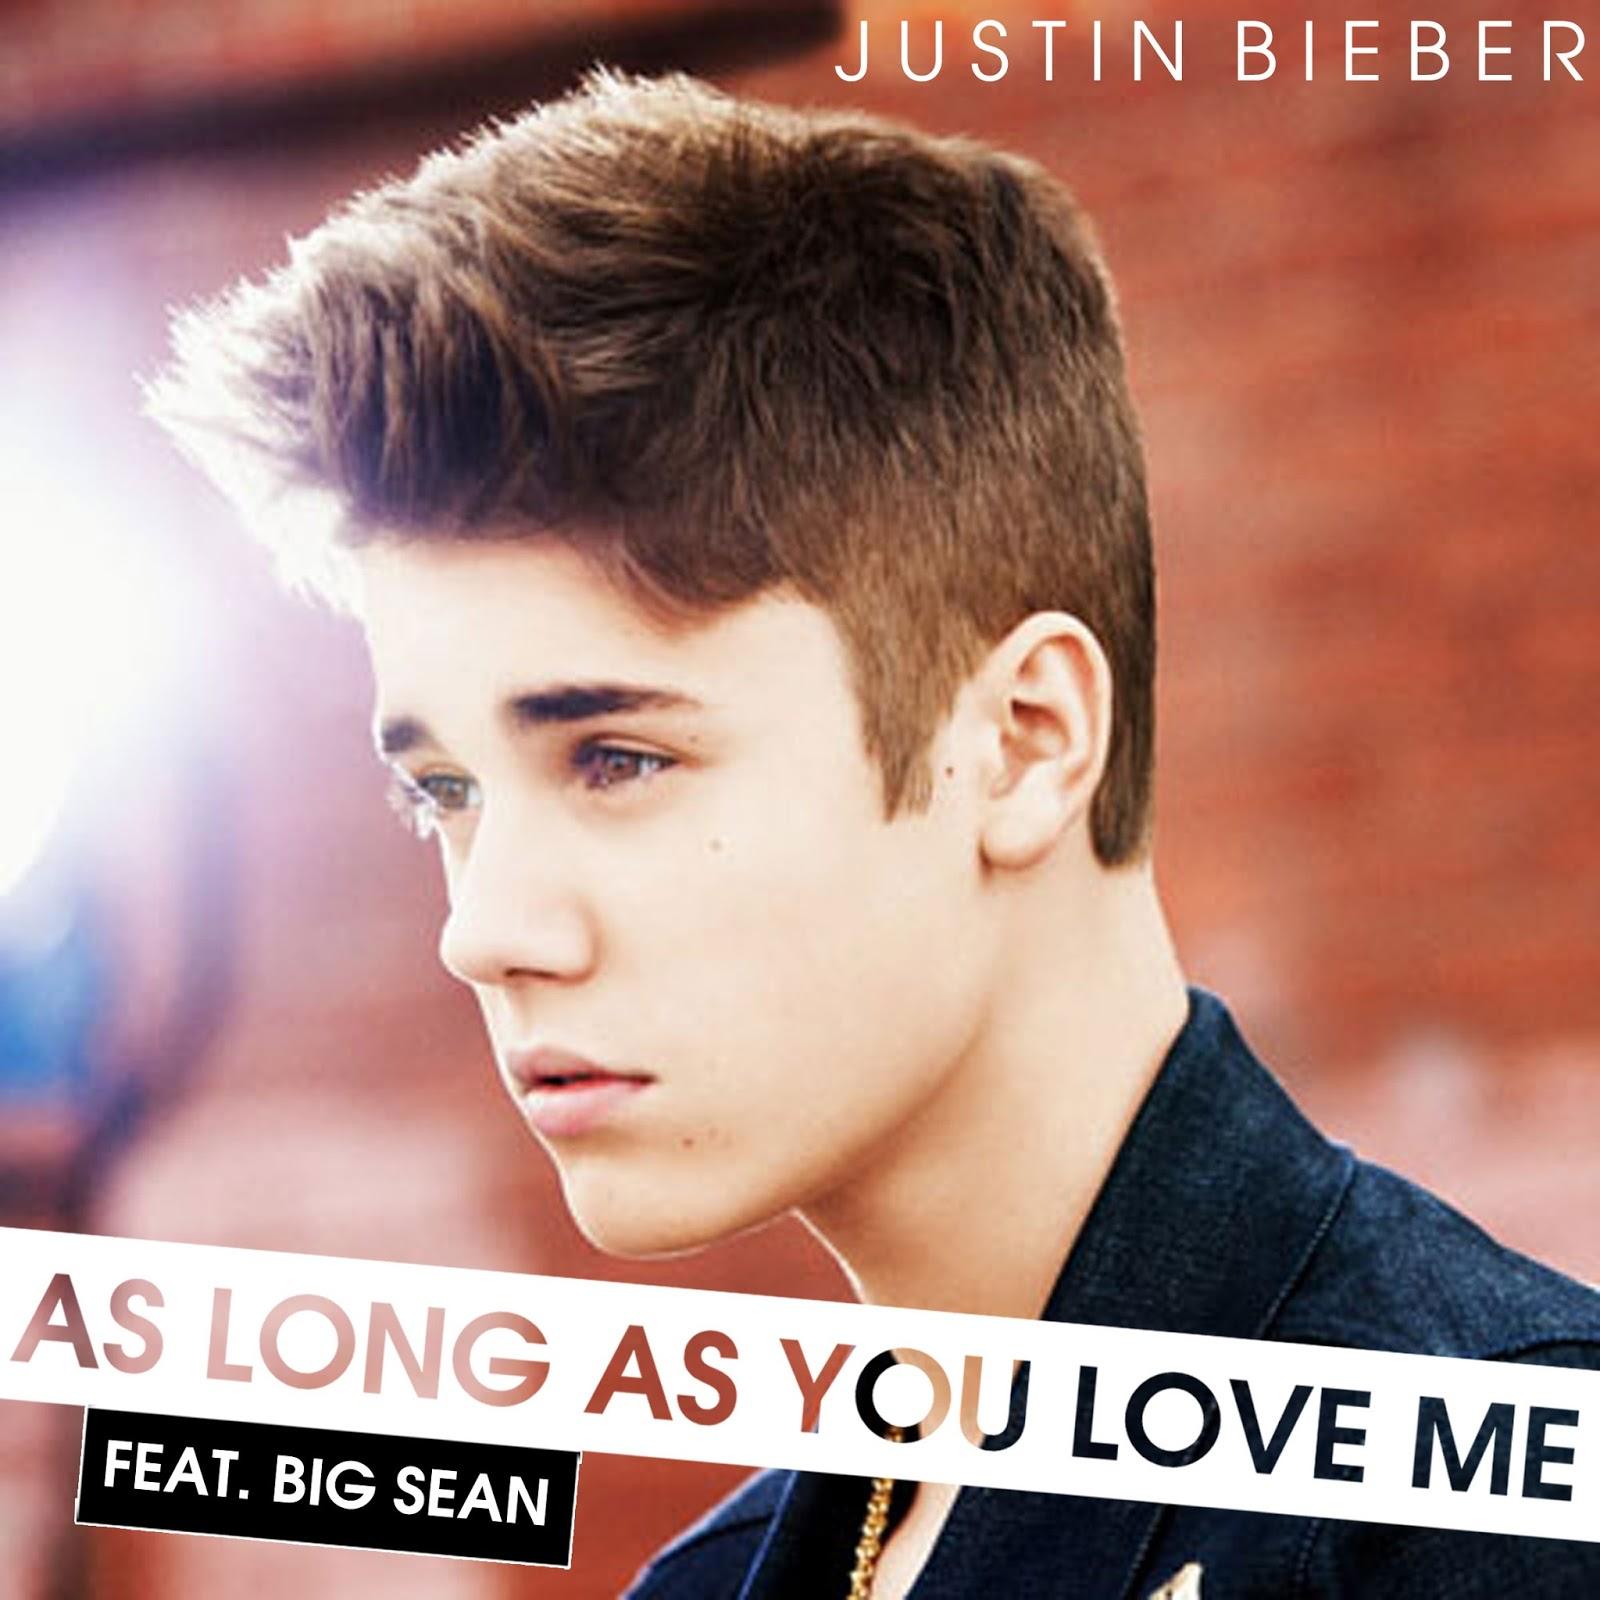 Justin Bieber Ft Big Sean As Long As You Love Me Guitar Chords